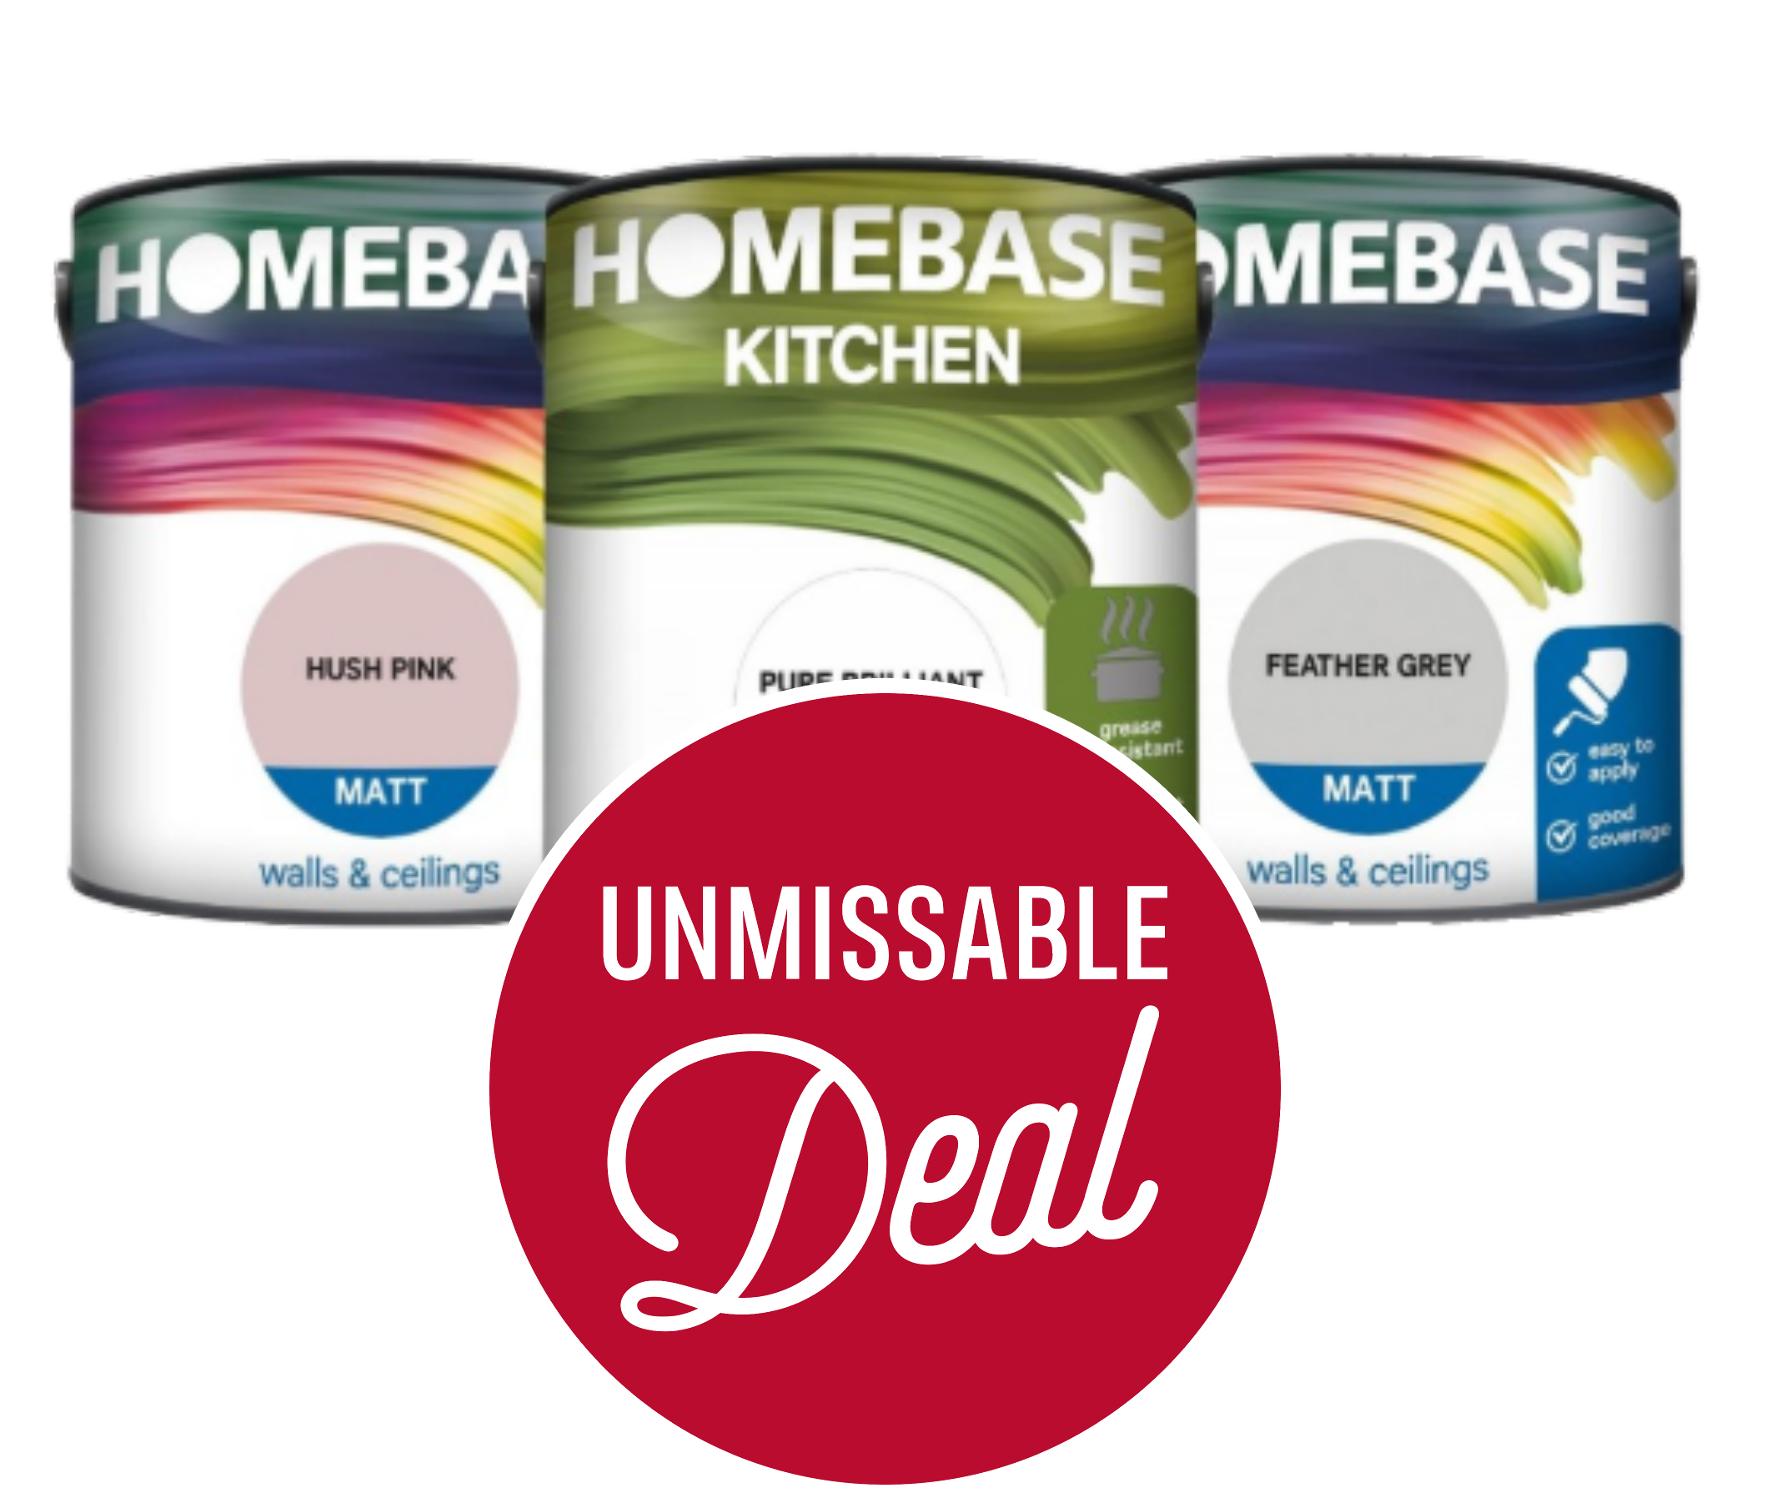 Buy One Get One Half Price on Homebase Coloured Emulsion